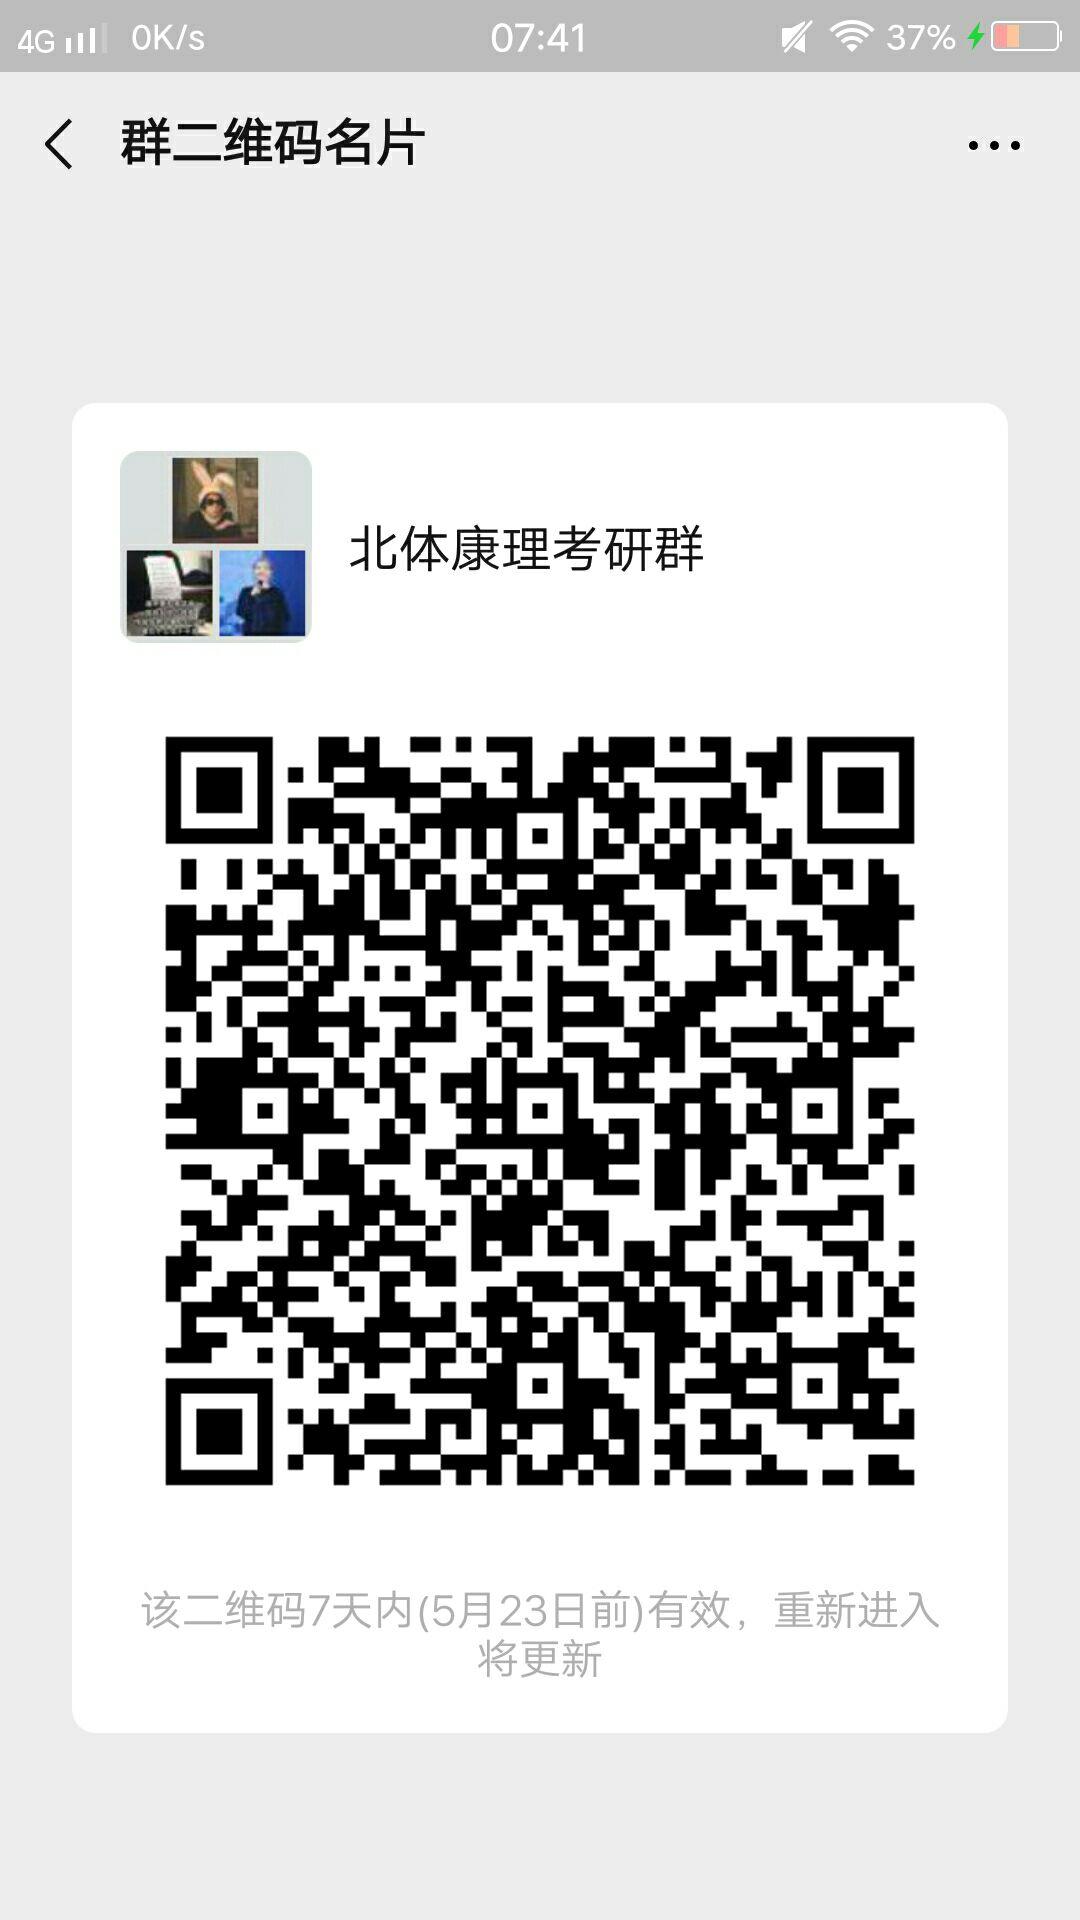 IMG_CA498CD1DEDBF61E80B9DCE3C71966.jpeg